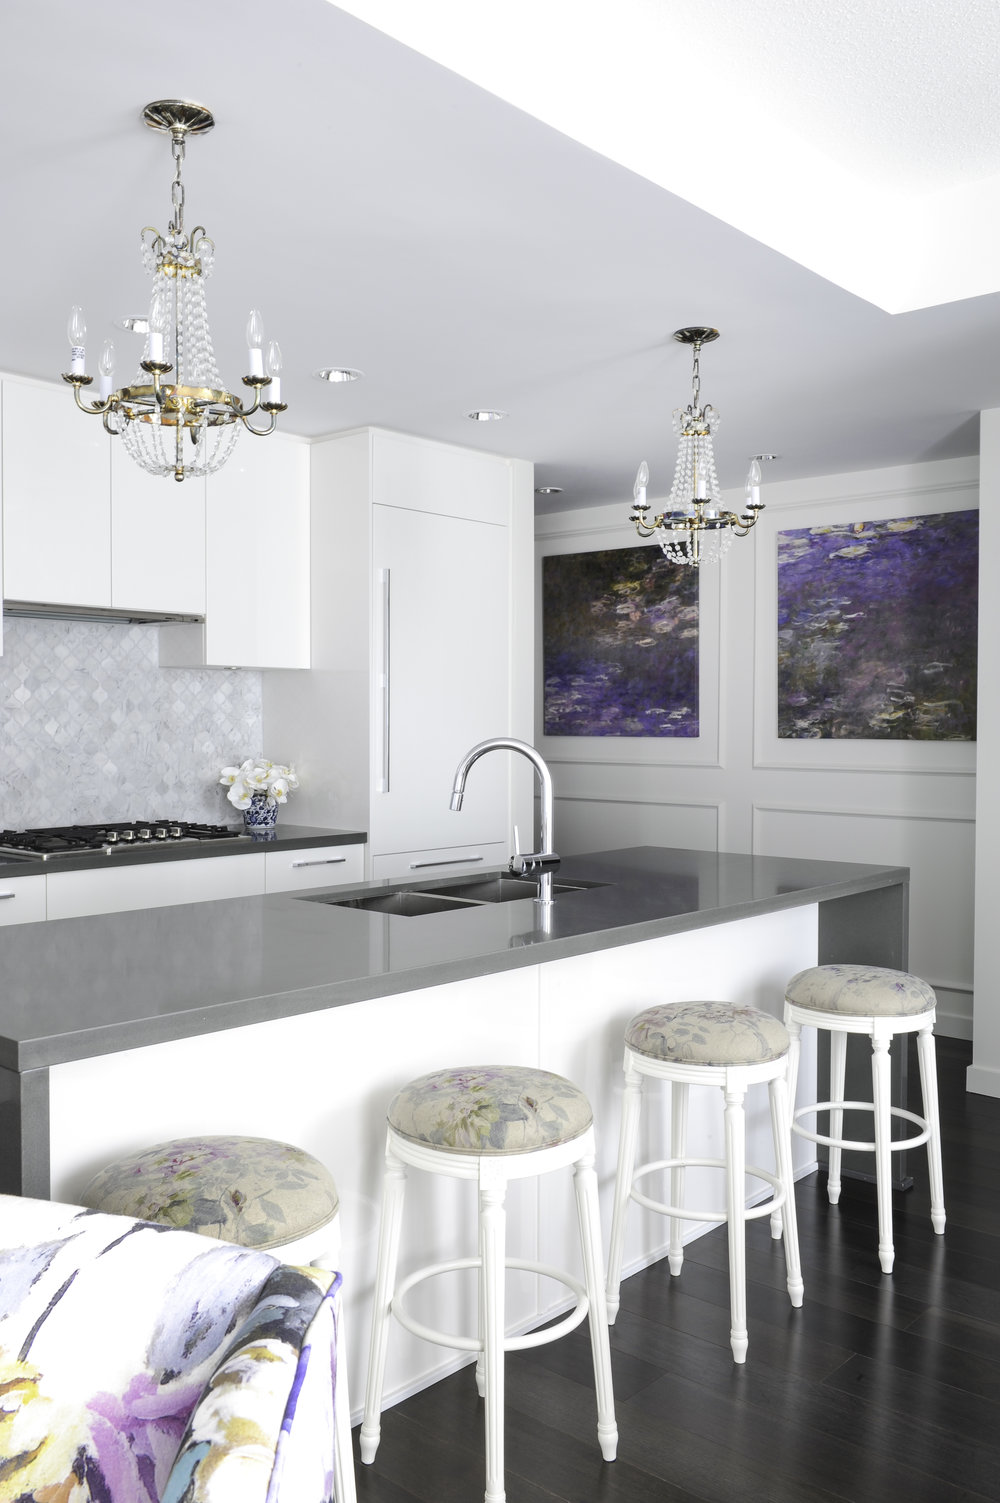 UBC Renovation & Interior Design